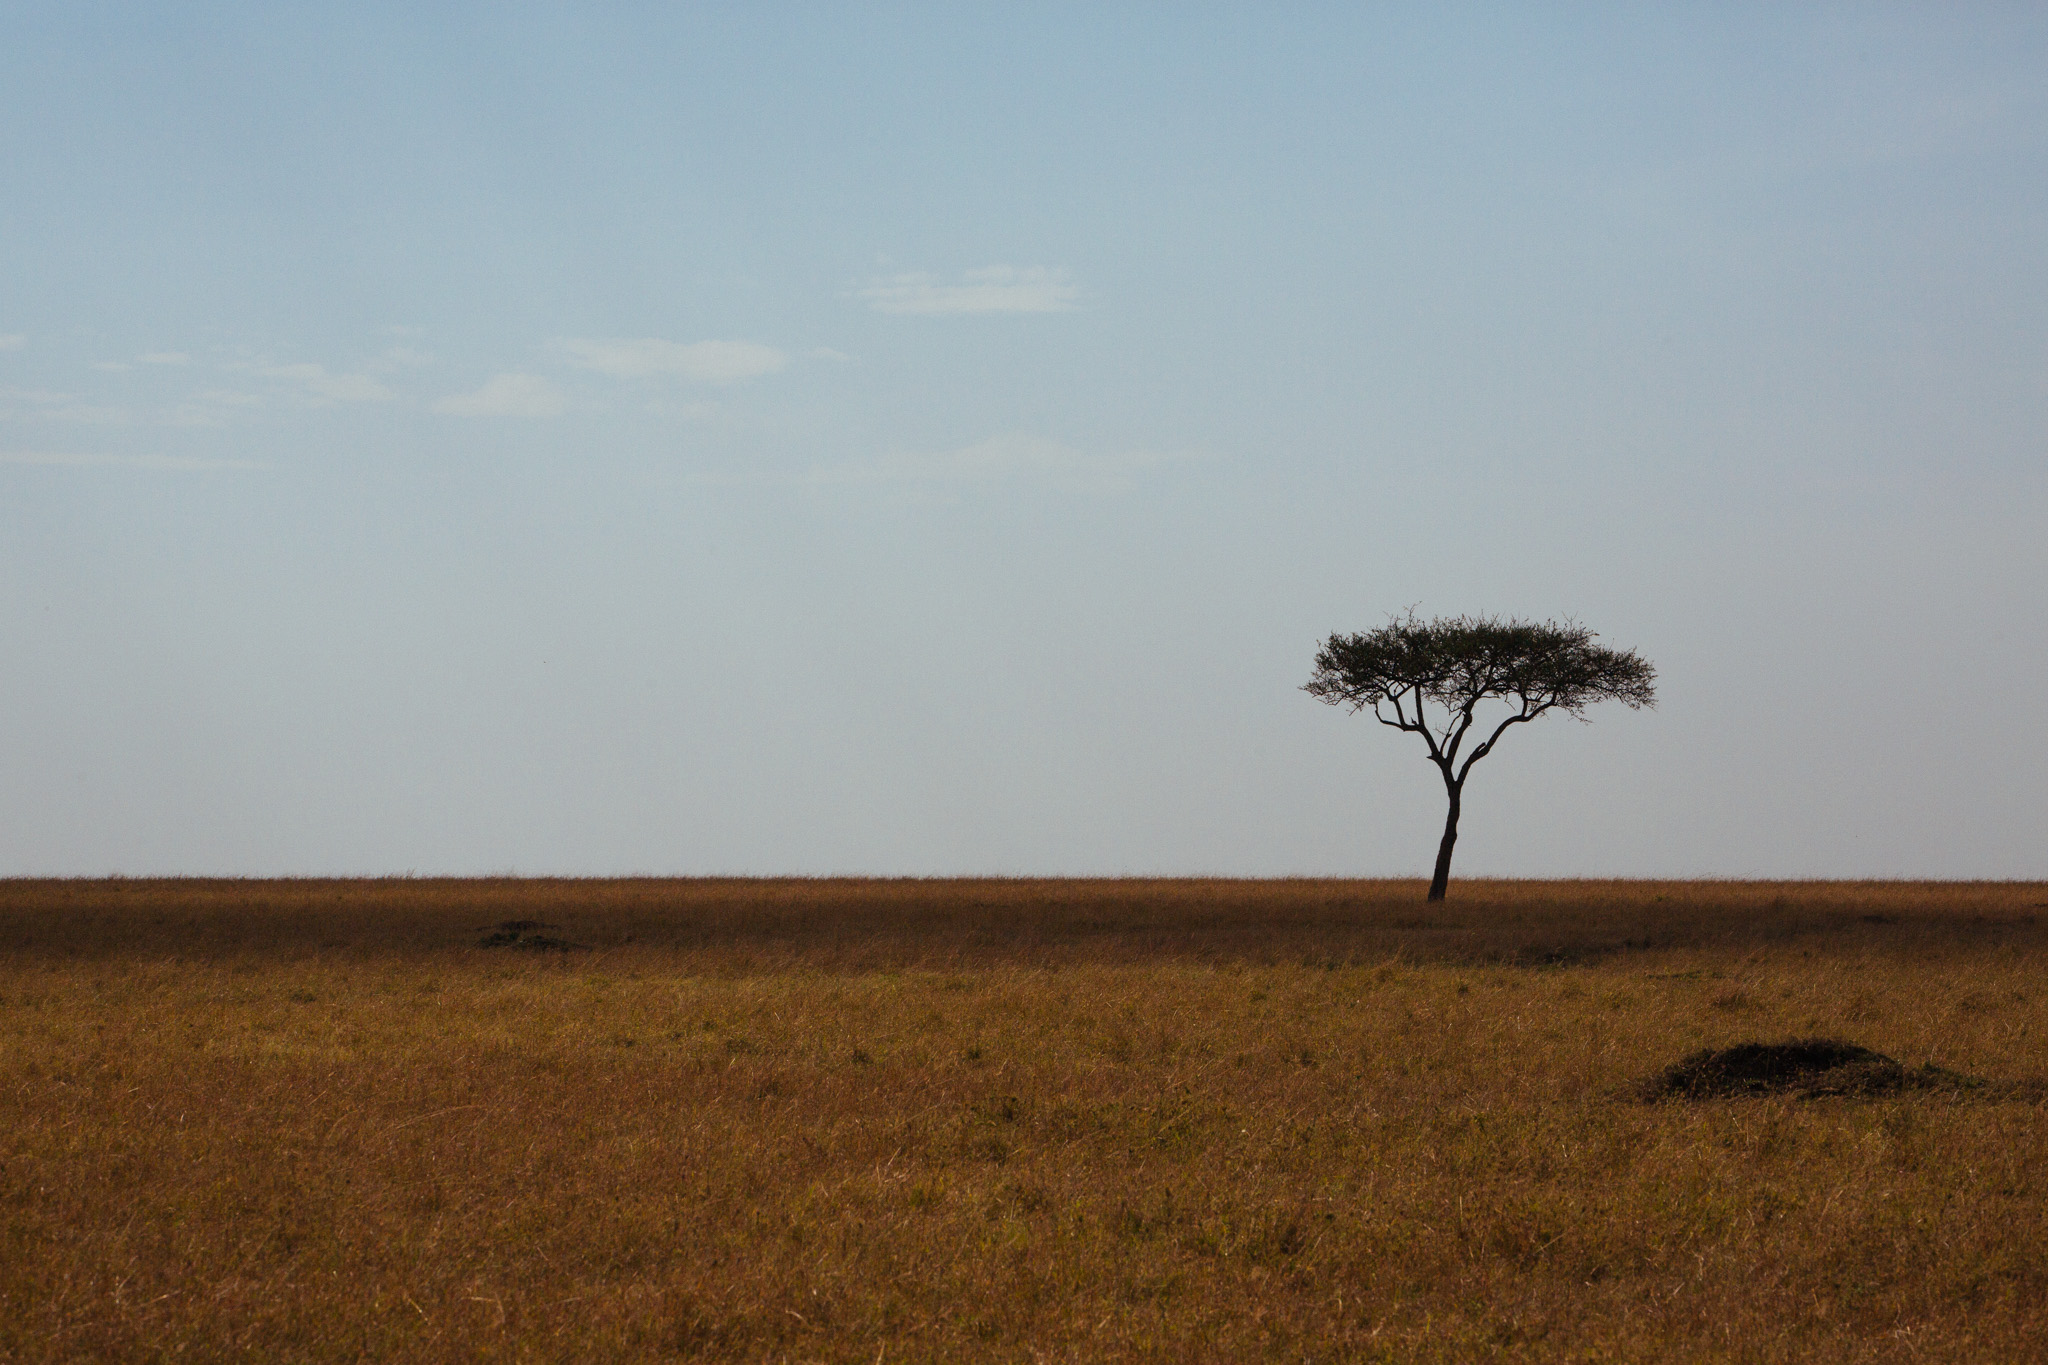 A solitary Acacia tree.